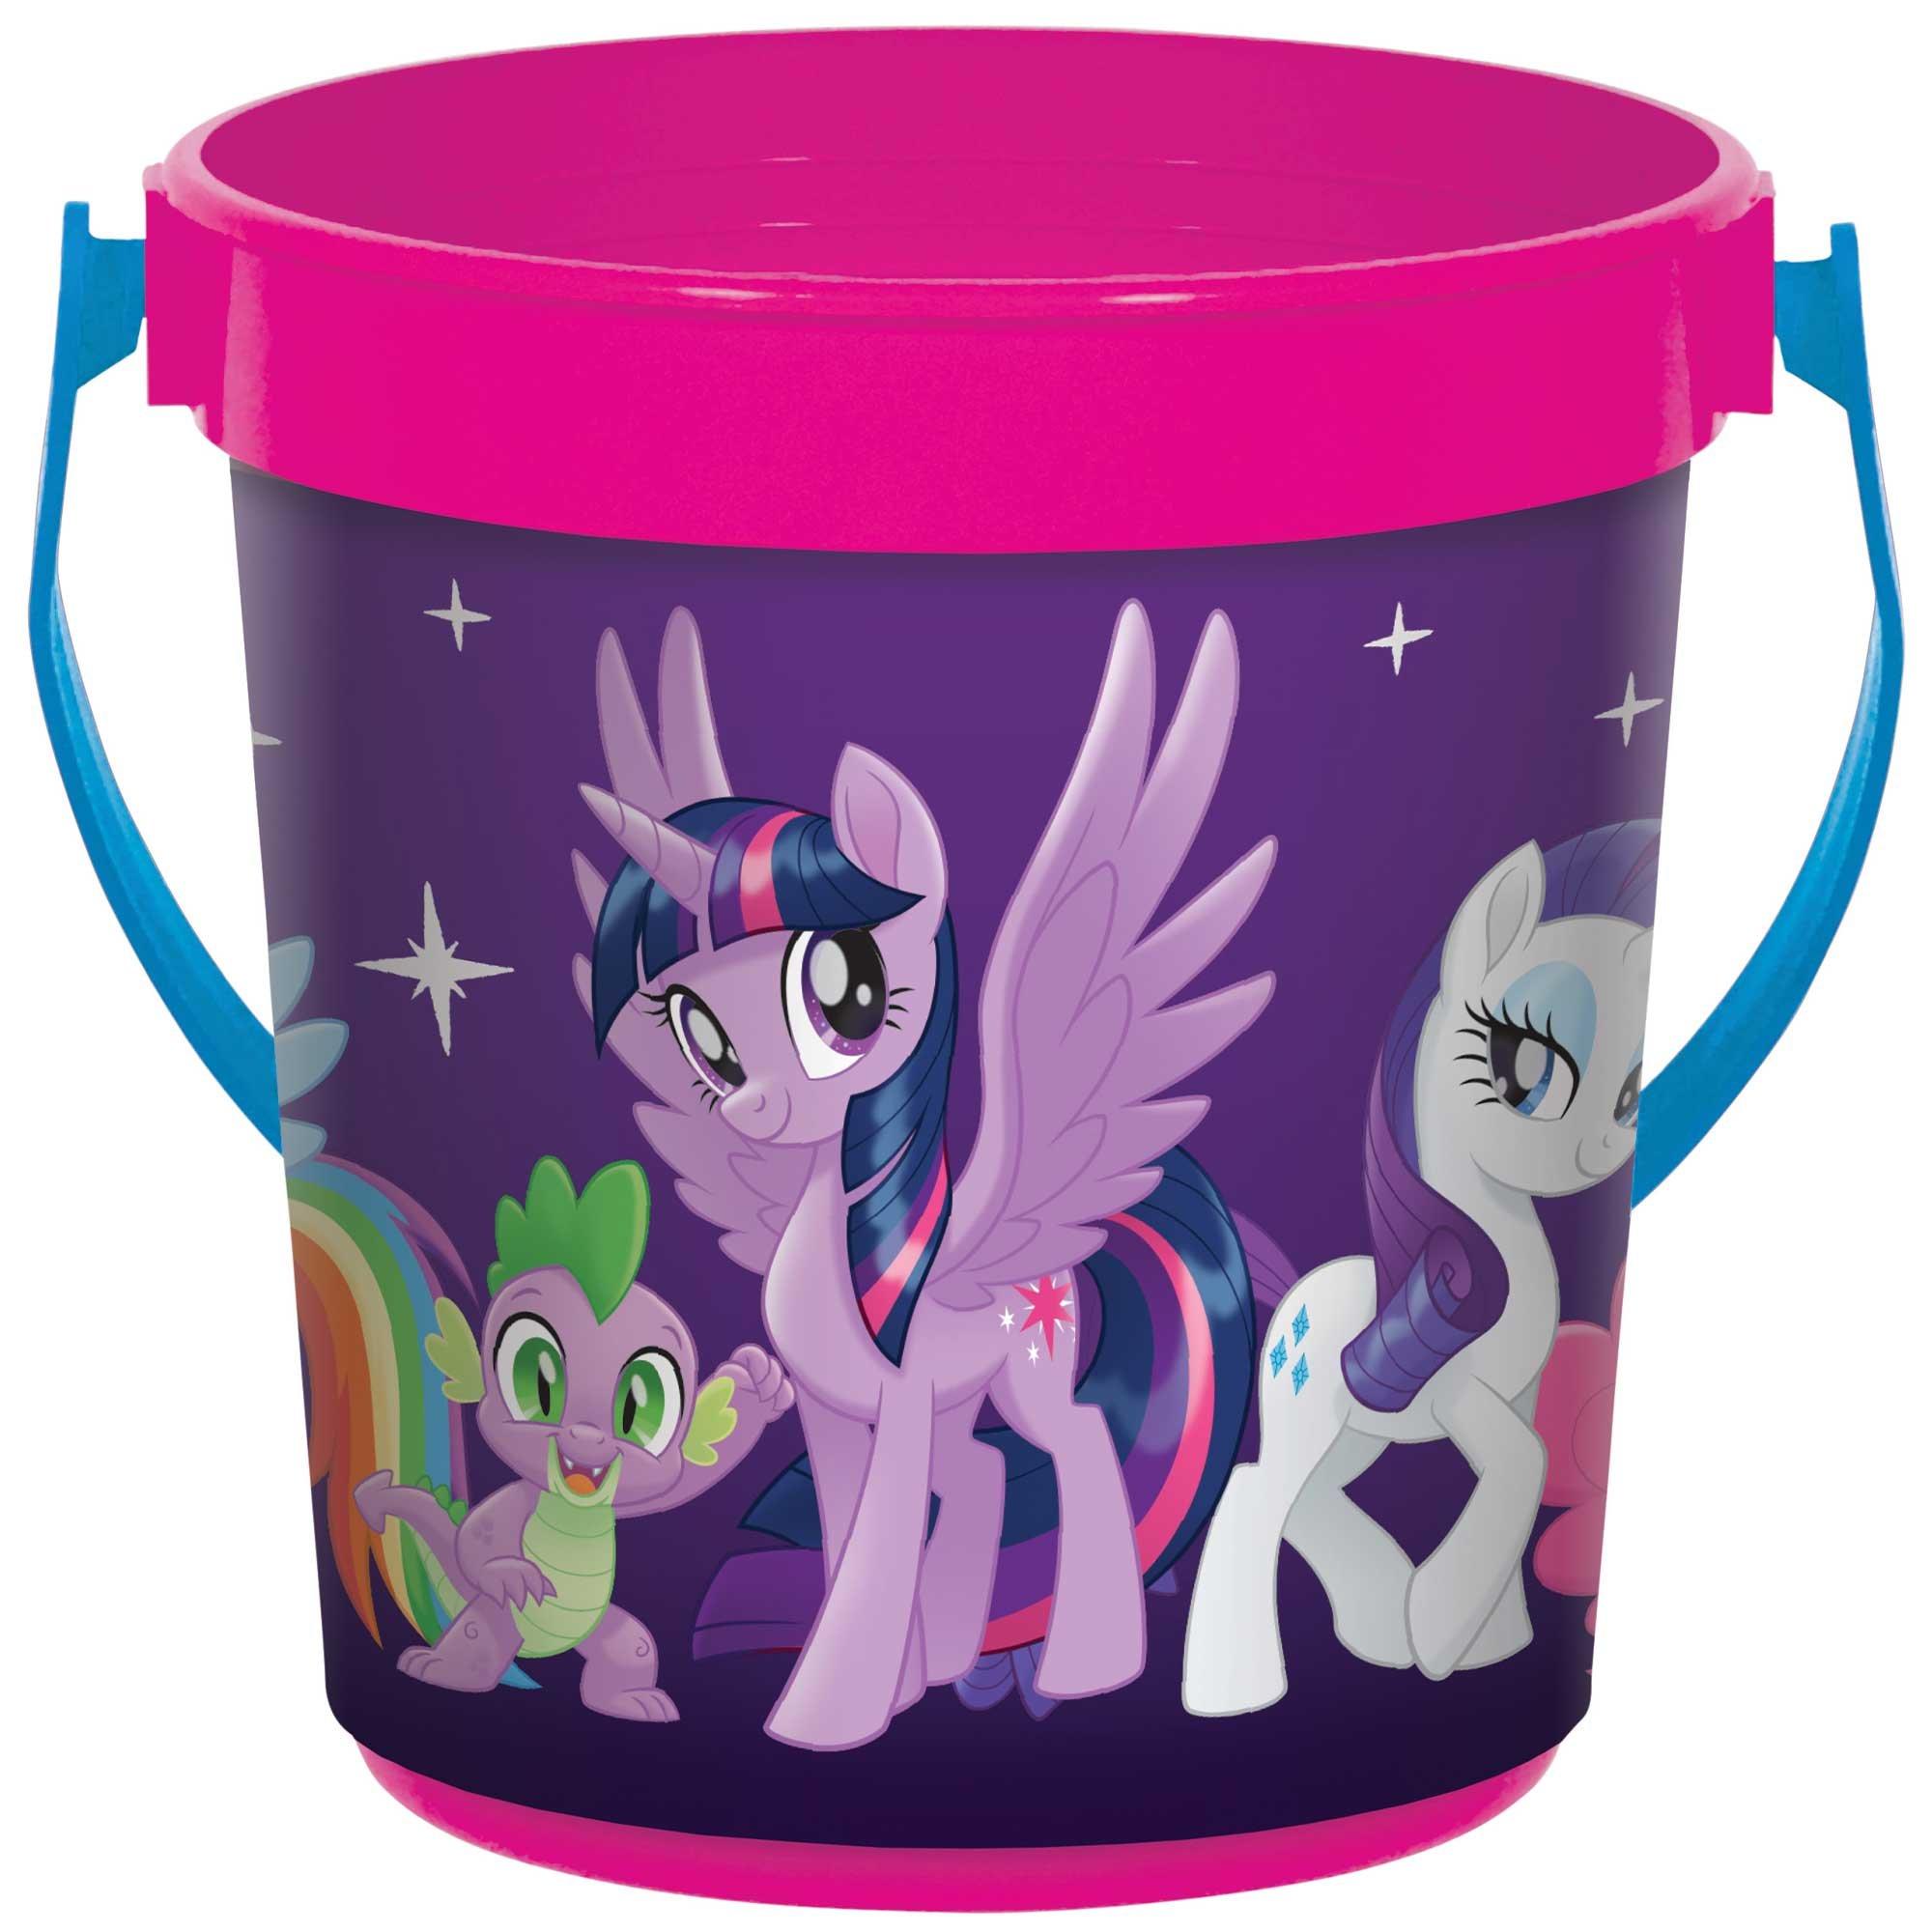 My Little Pony Adventures Plastic Favor Container